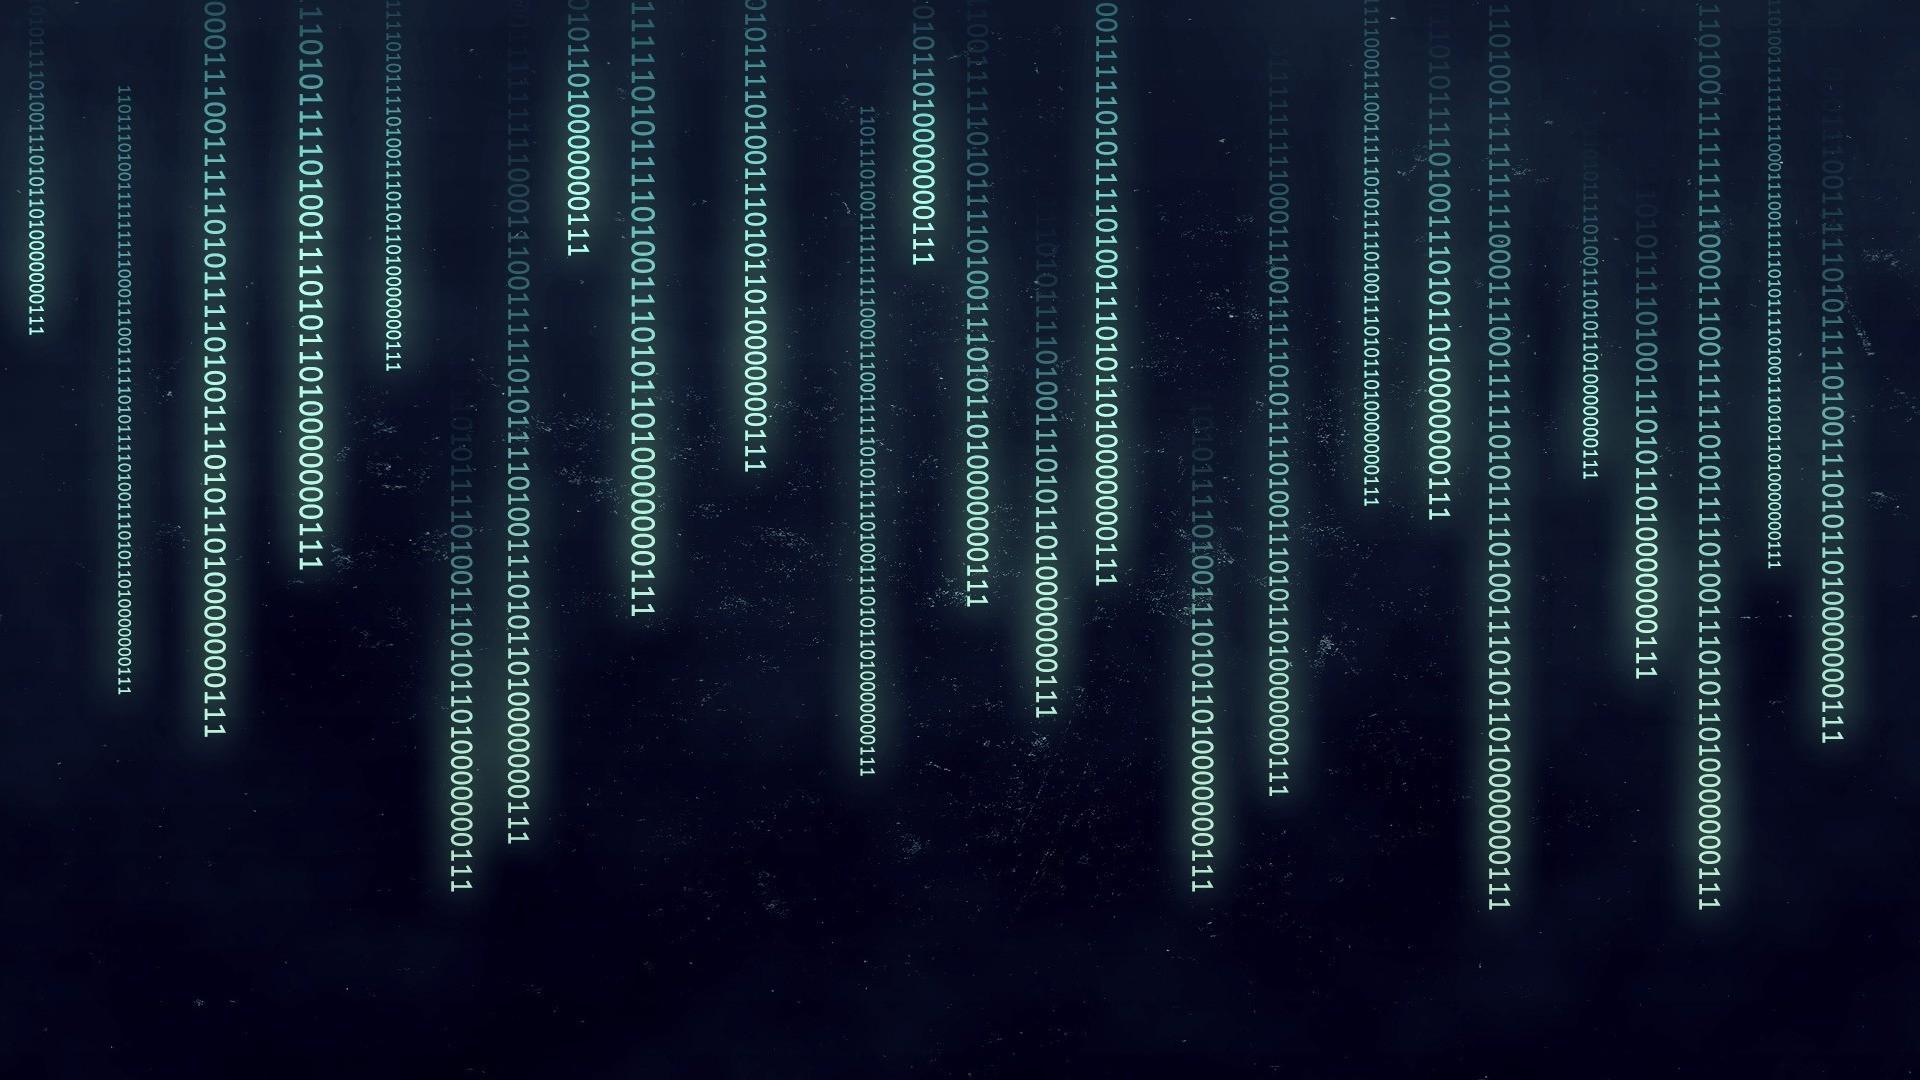 Hacker hd wallpaper download